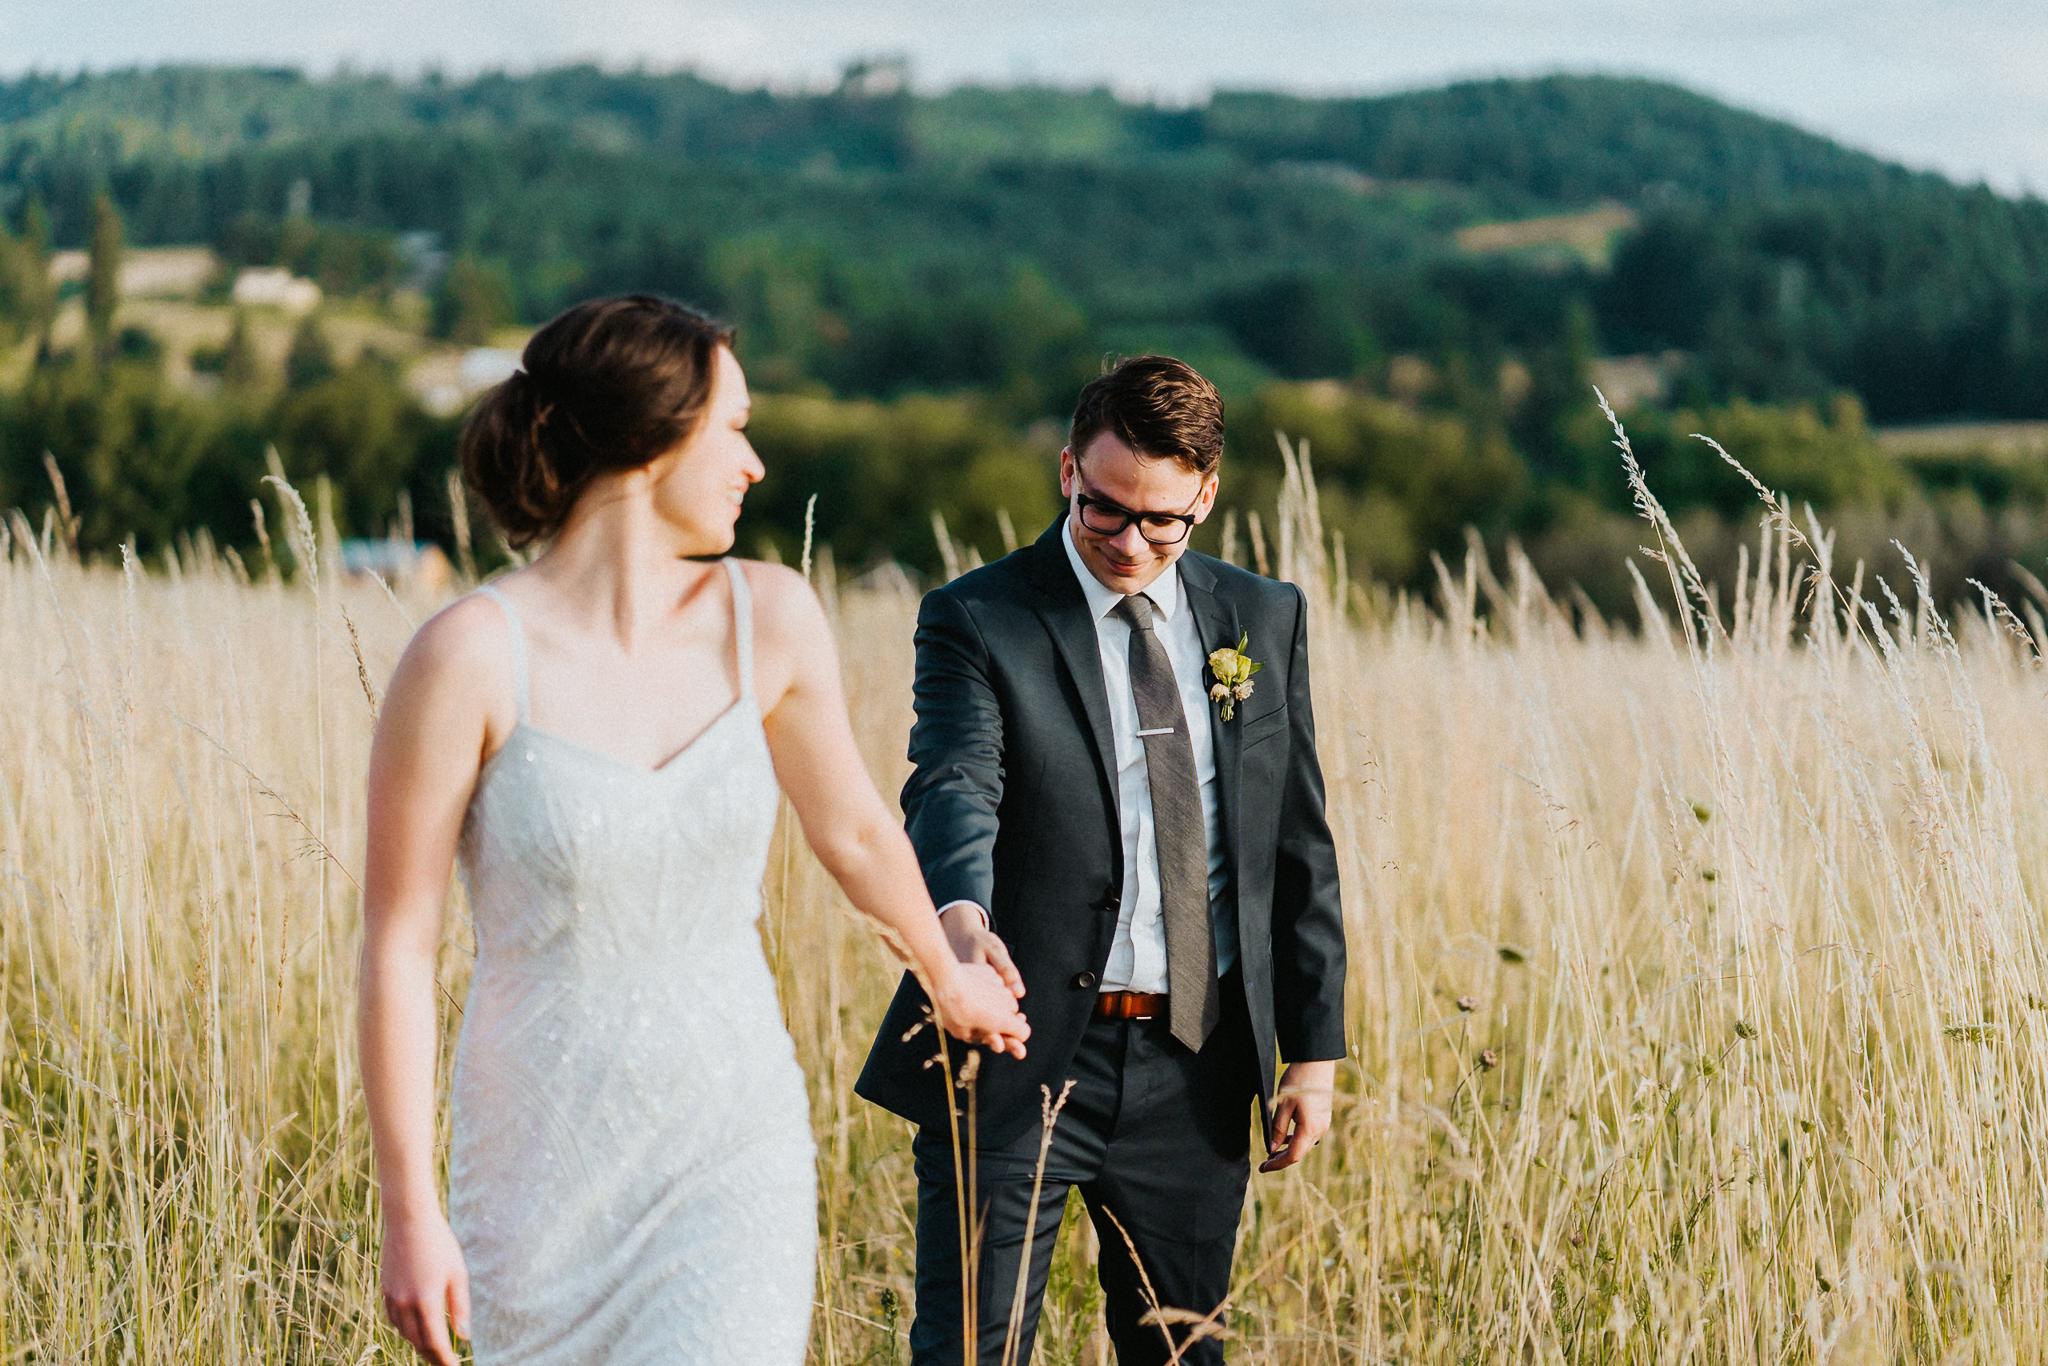 Bride lead groom candid portrait Photography Portland Oregon Wedding